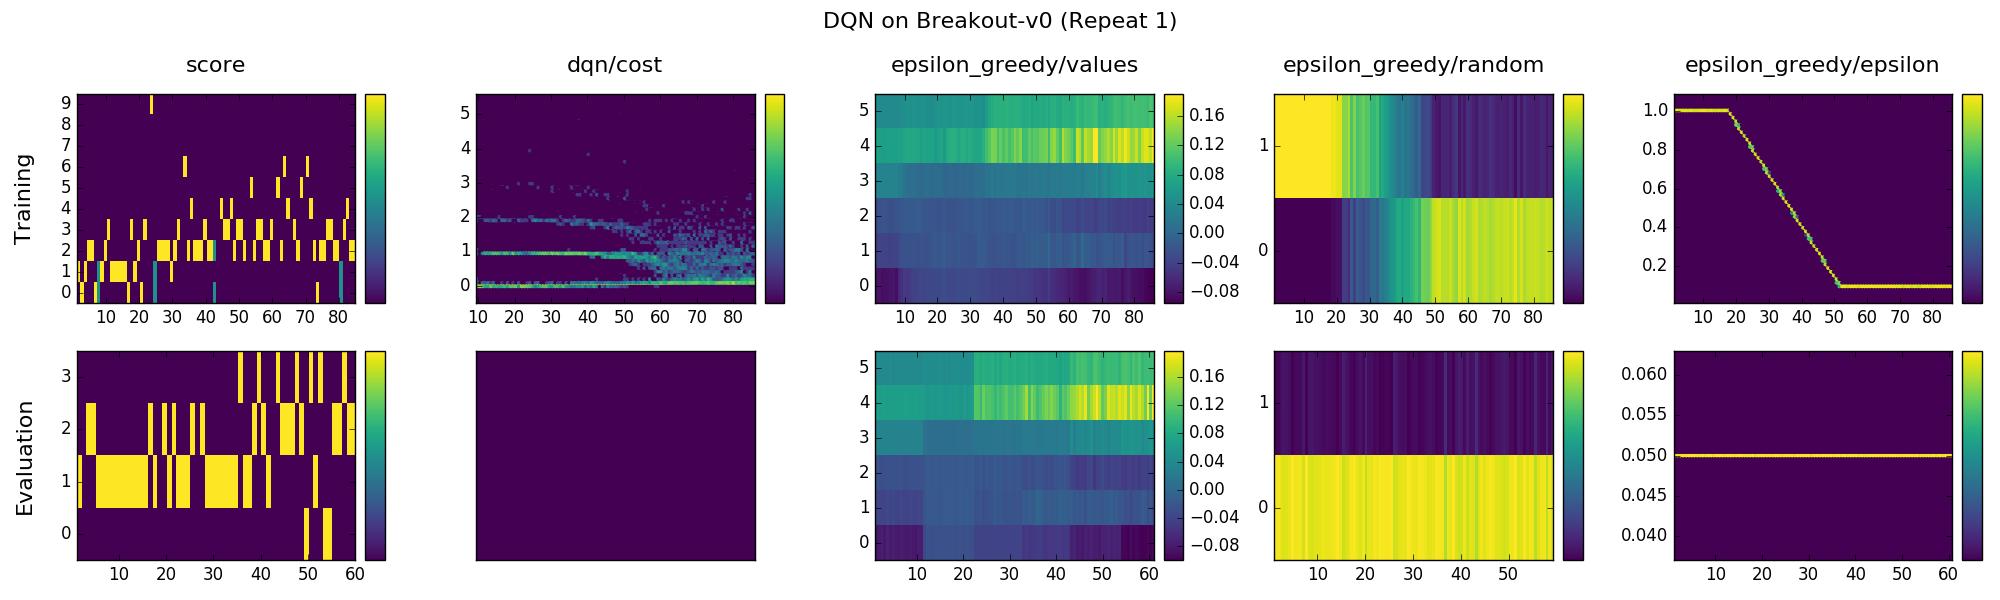 DQN statistics on Breakout